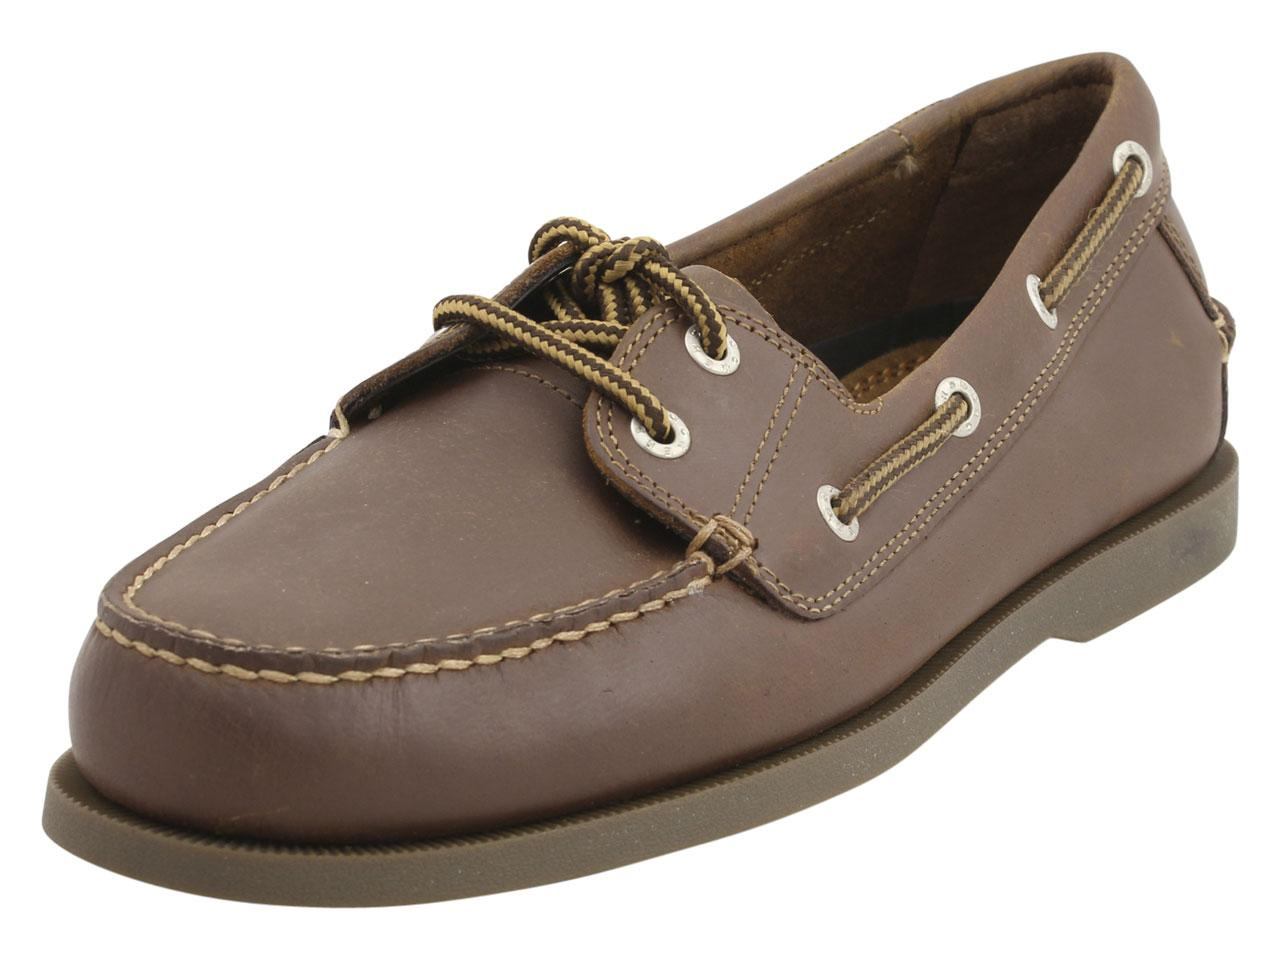 Image of Dockers Men's Vargas Loafers Boat Shoes - Brown - 10 D(M) US